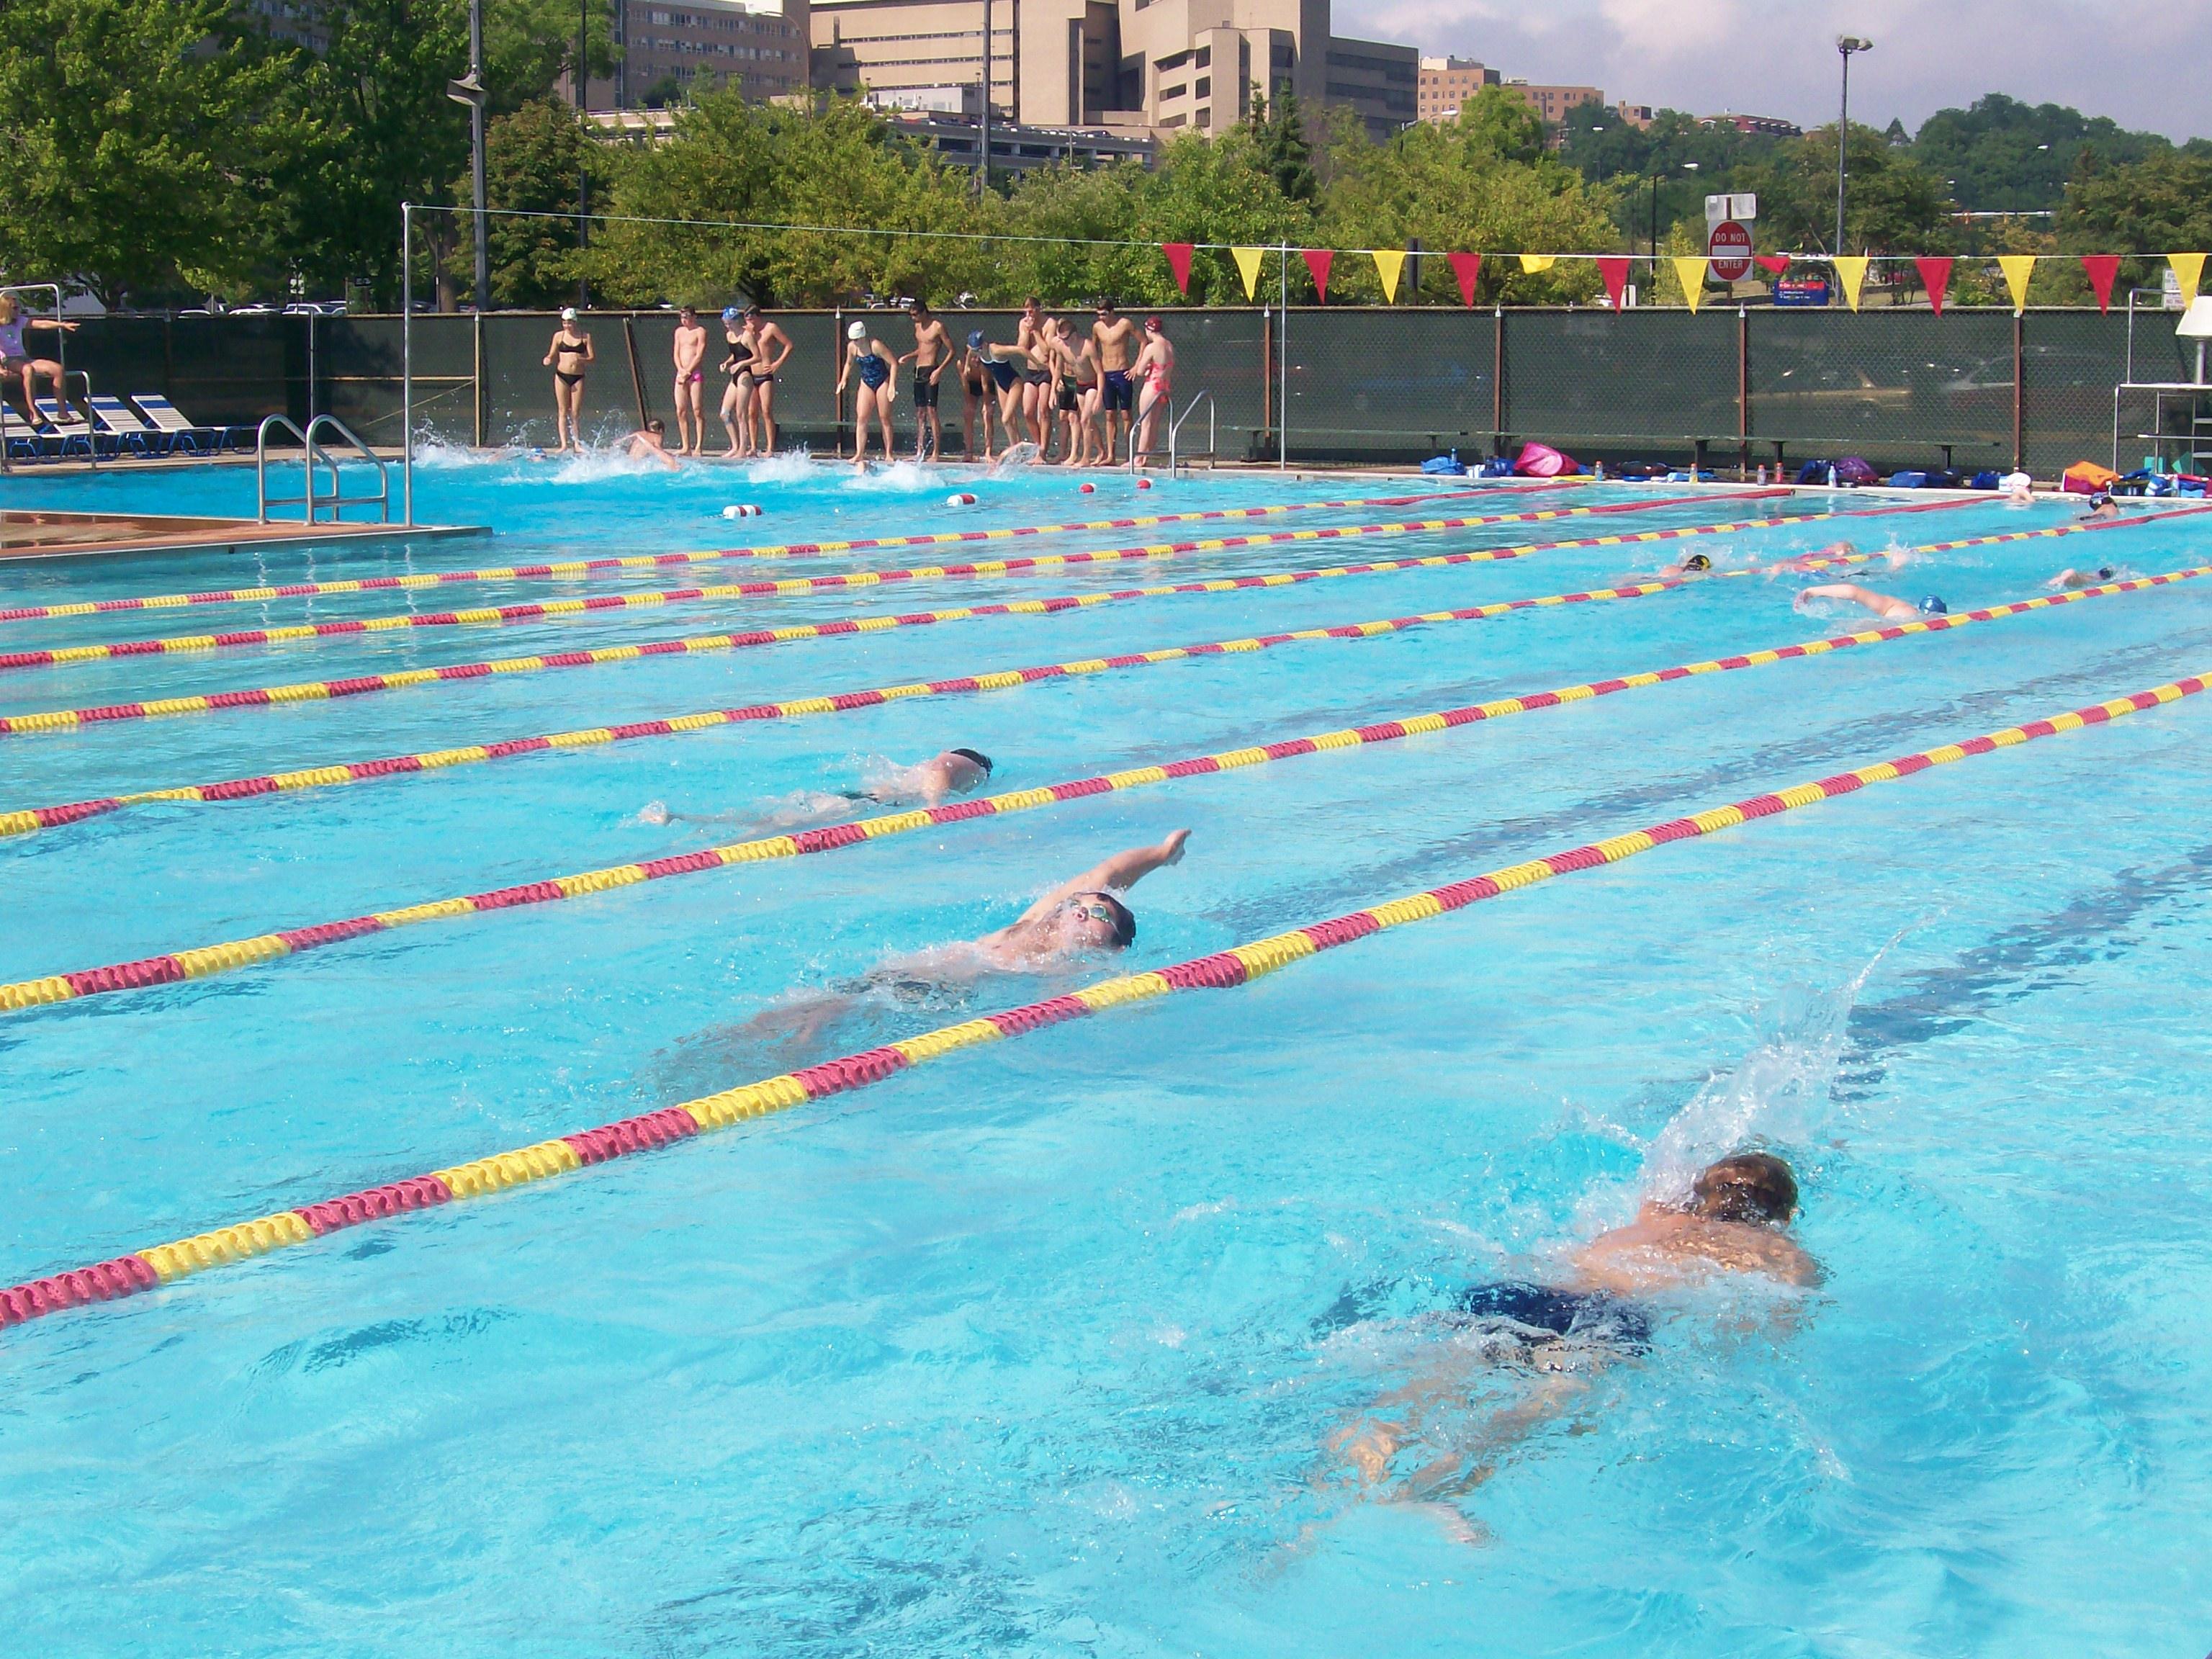 Public swimming pools archives reinhart reinhart - Best public swimming pools in massachusetts ...